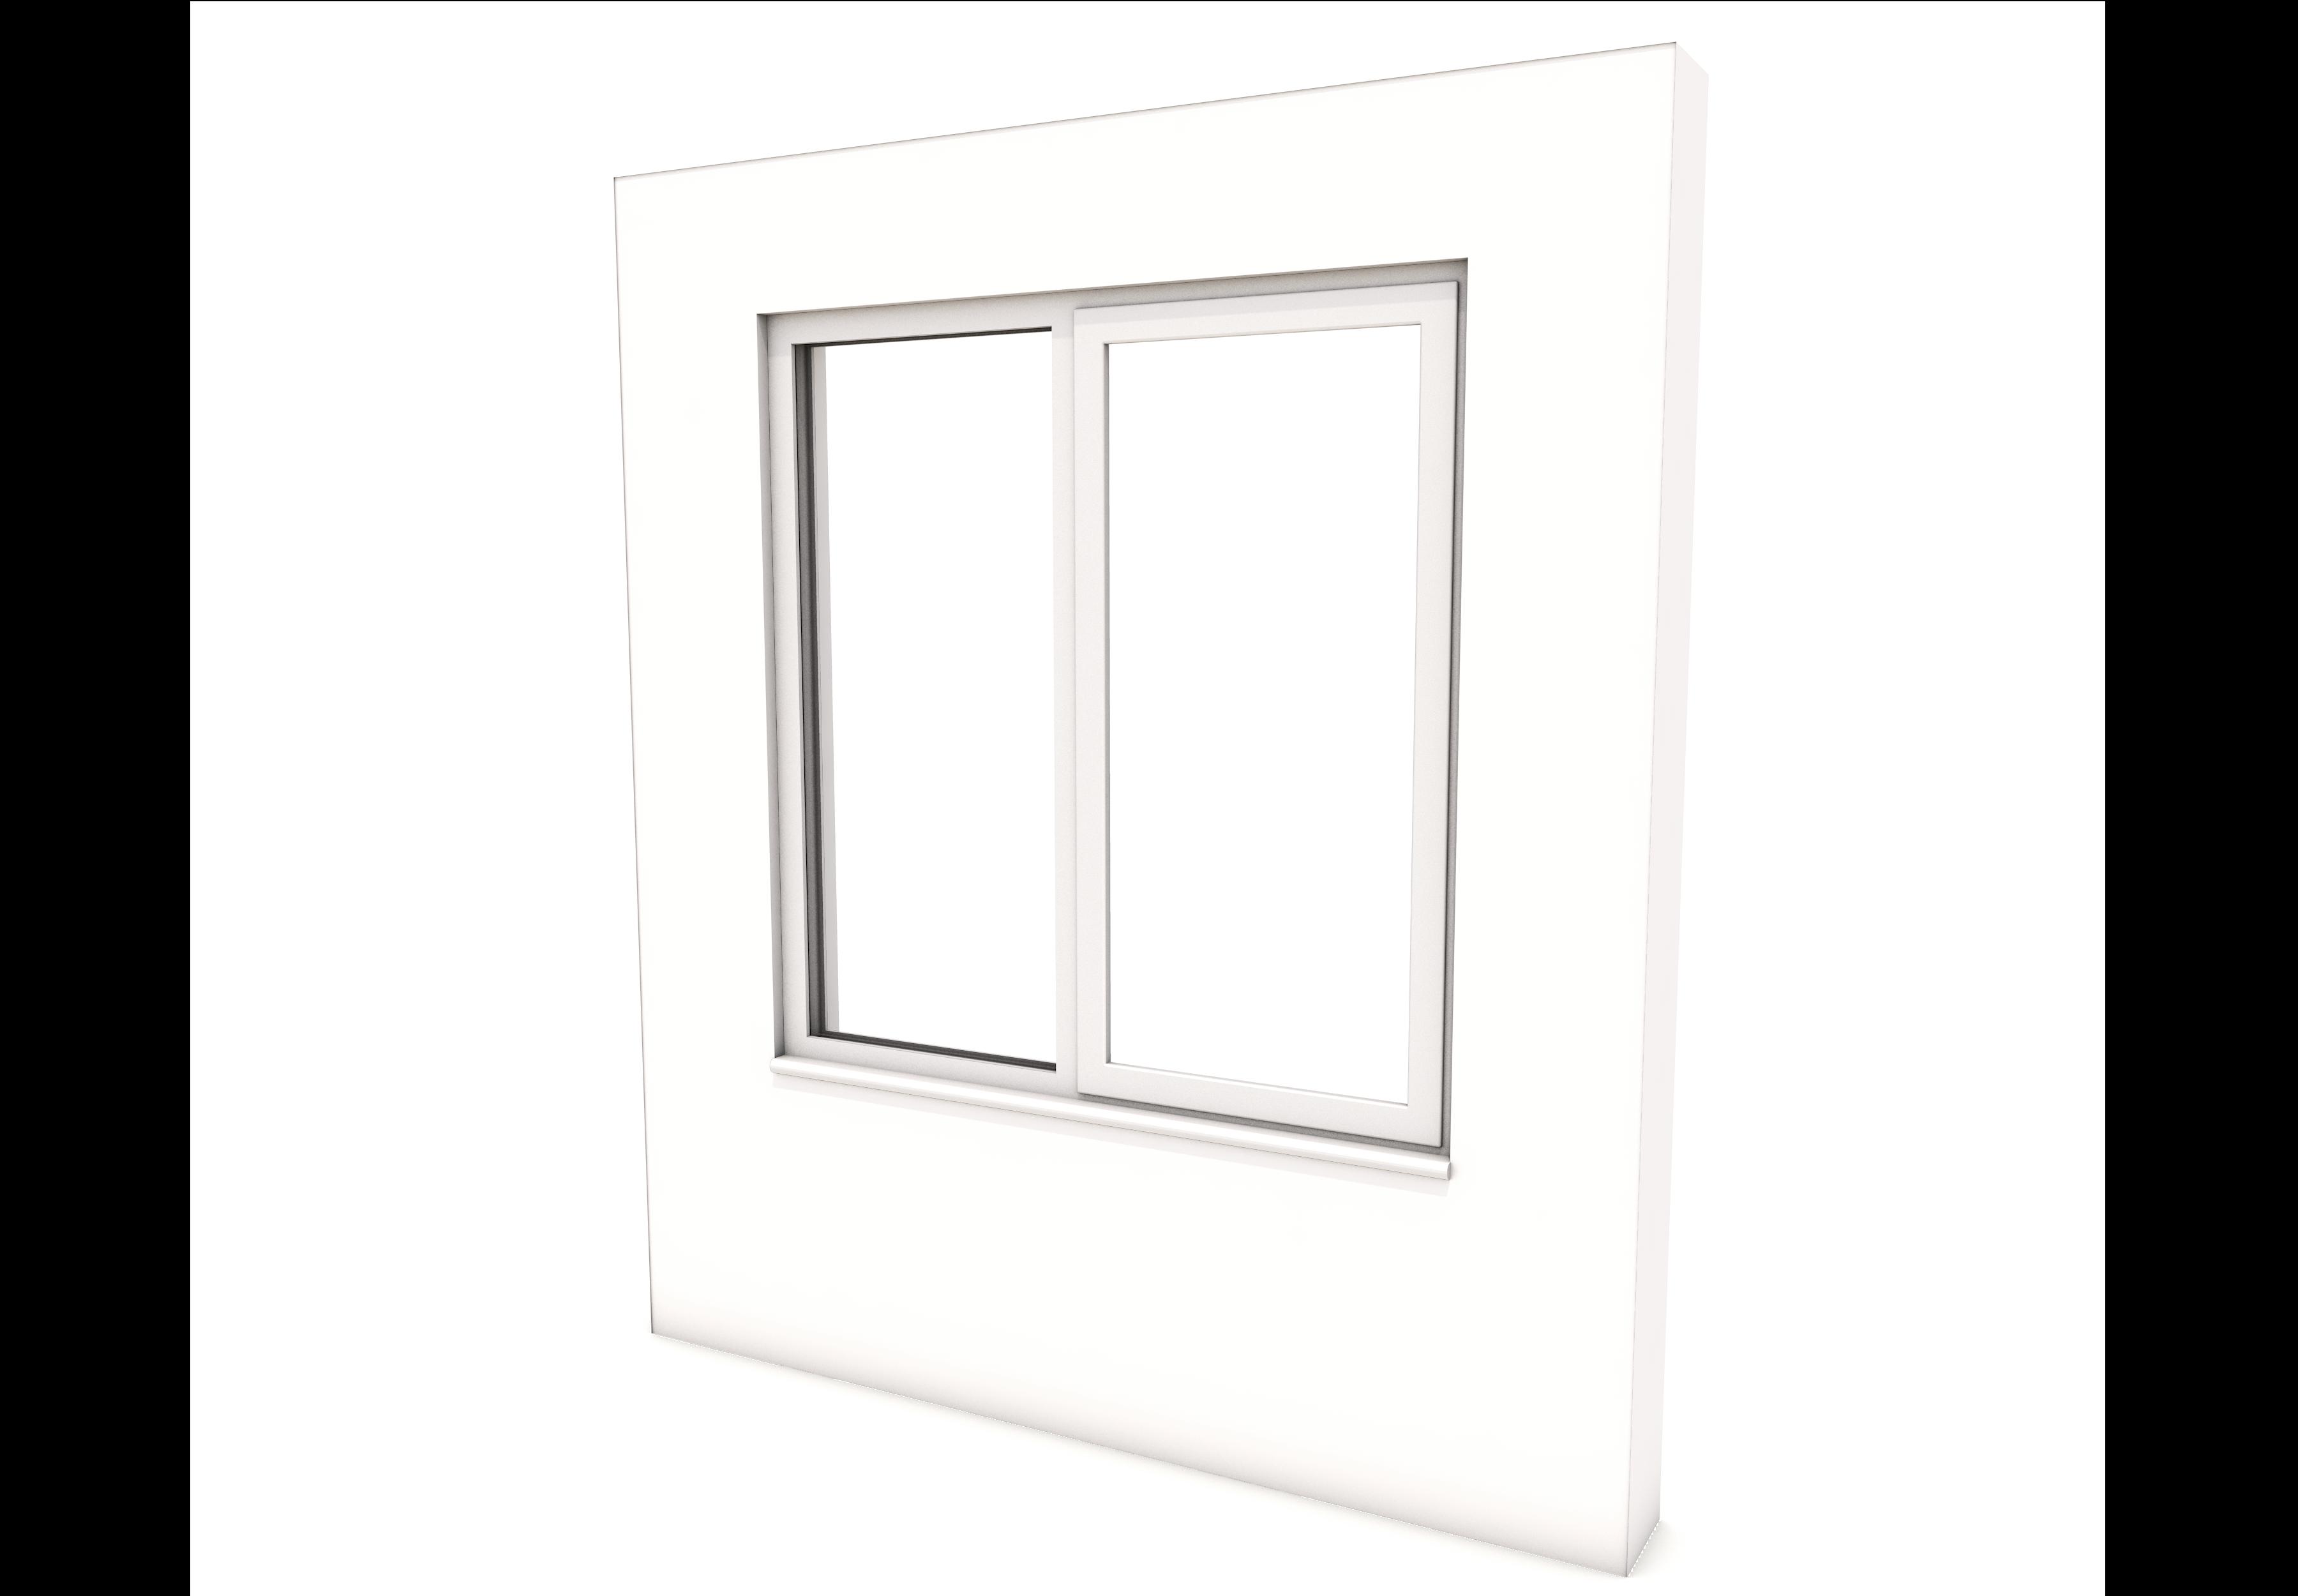 Smart Alitherm 300 Window - 1200 x 1200 mm - Left Fixed